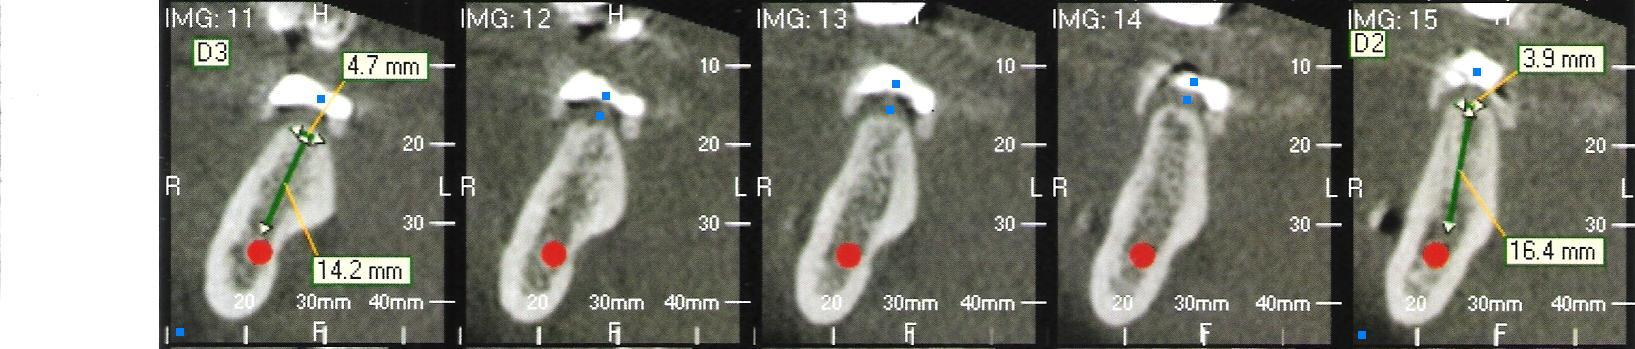 Tc-cone-beam-3d-Muolo-zona-45-46-bis.JPG